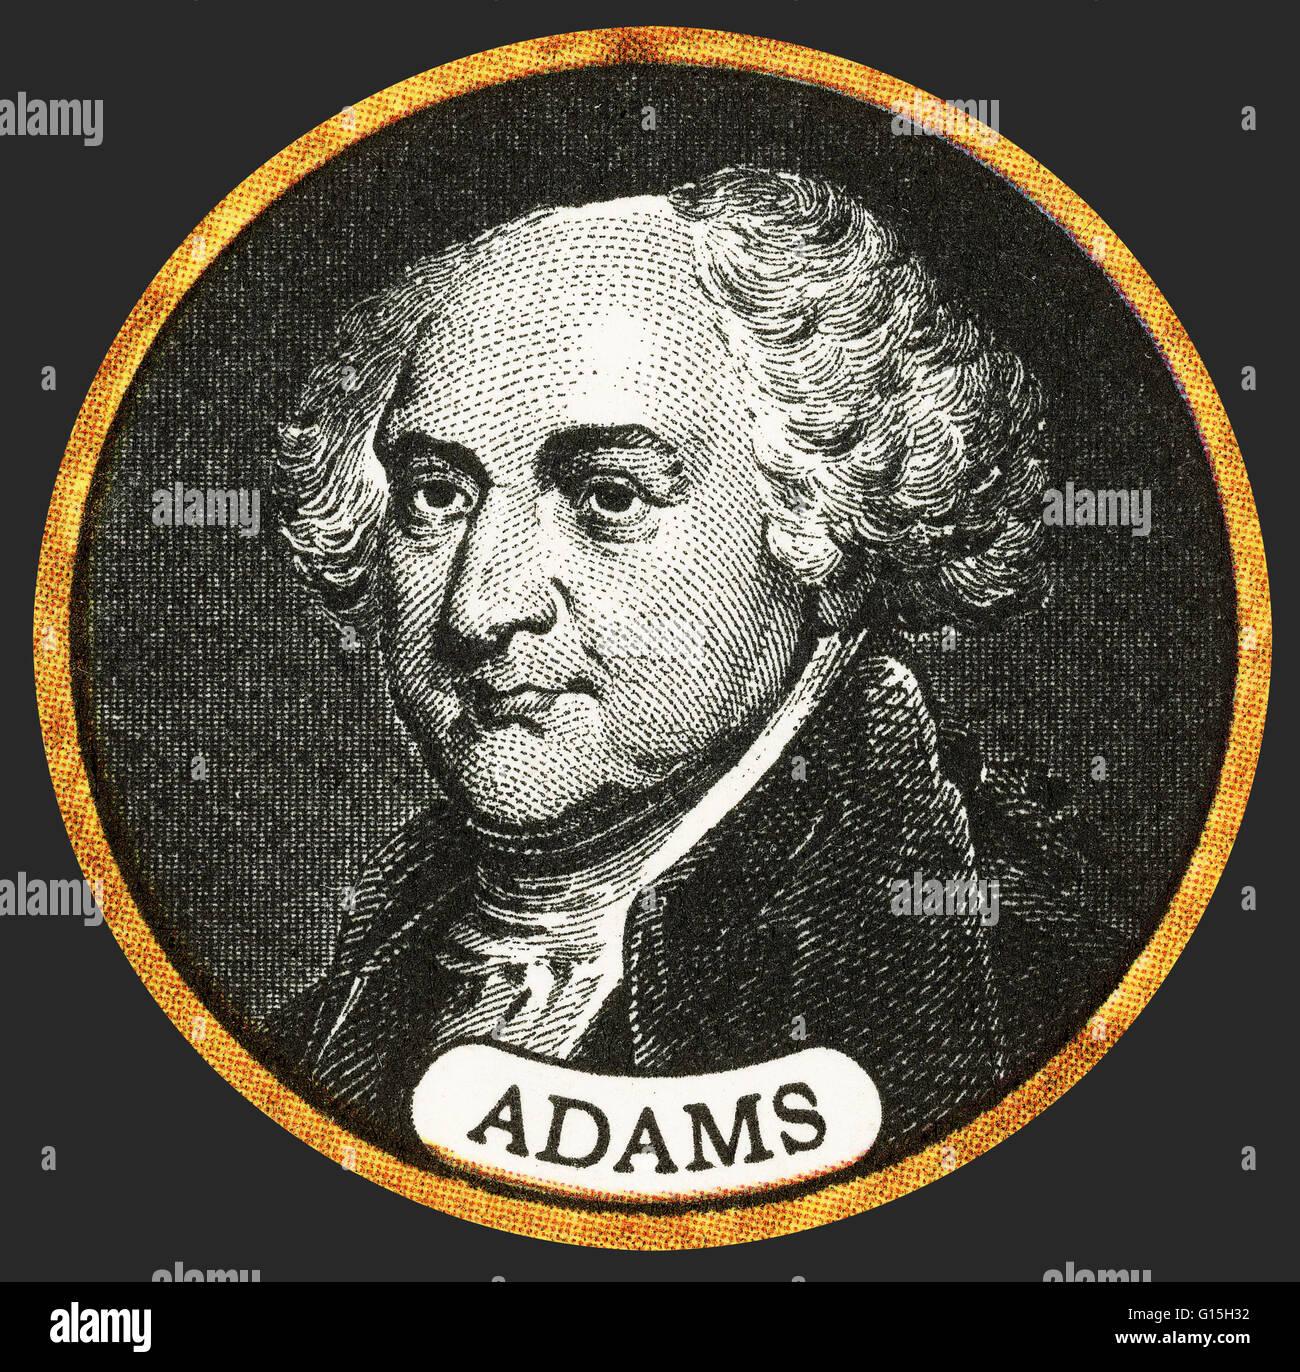 John Adams (October 19, 1735 - July 4, 1826) was an American